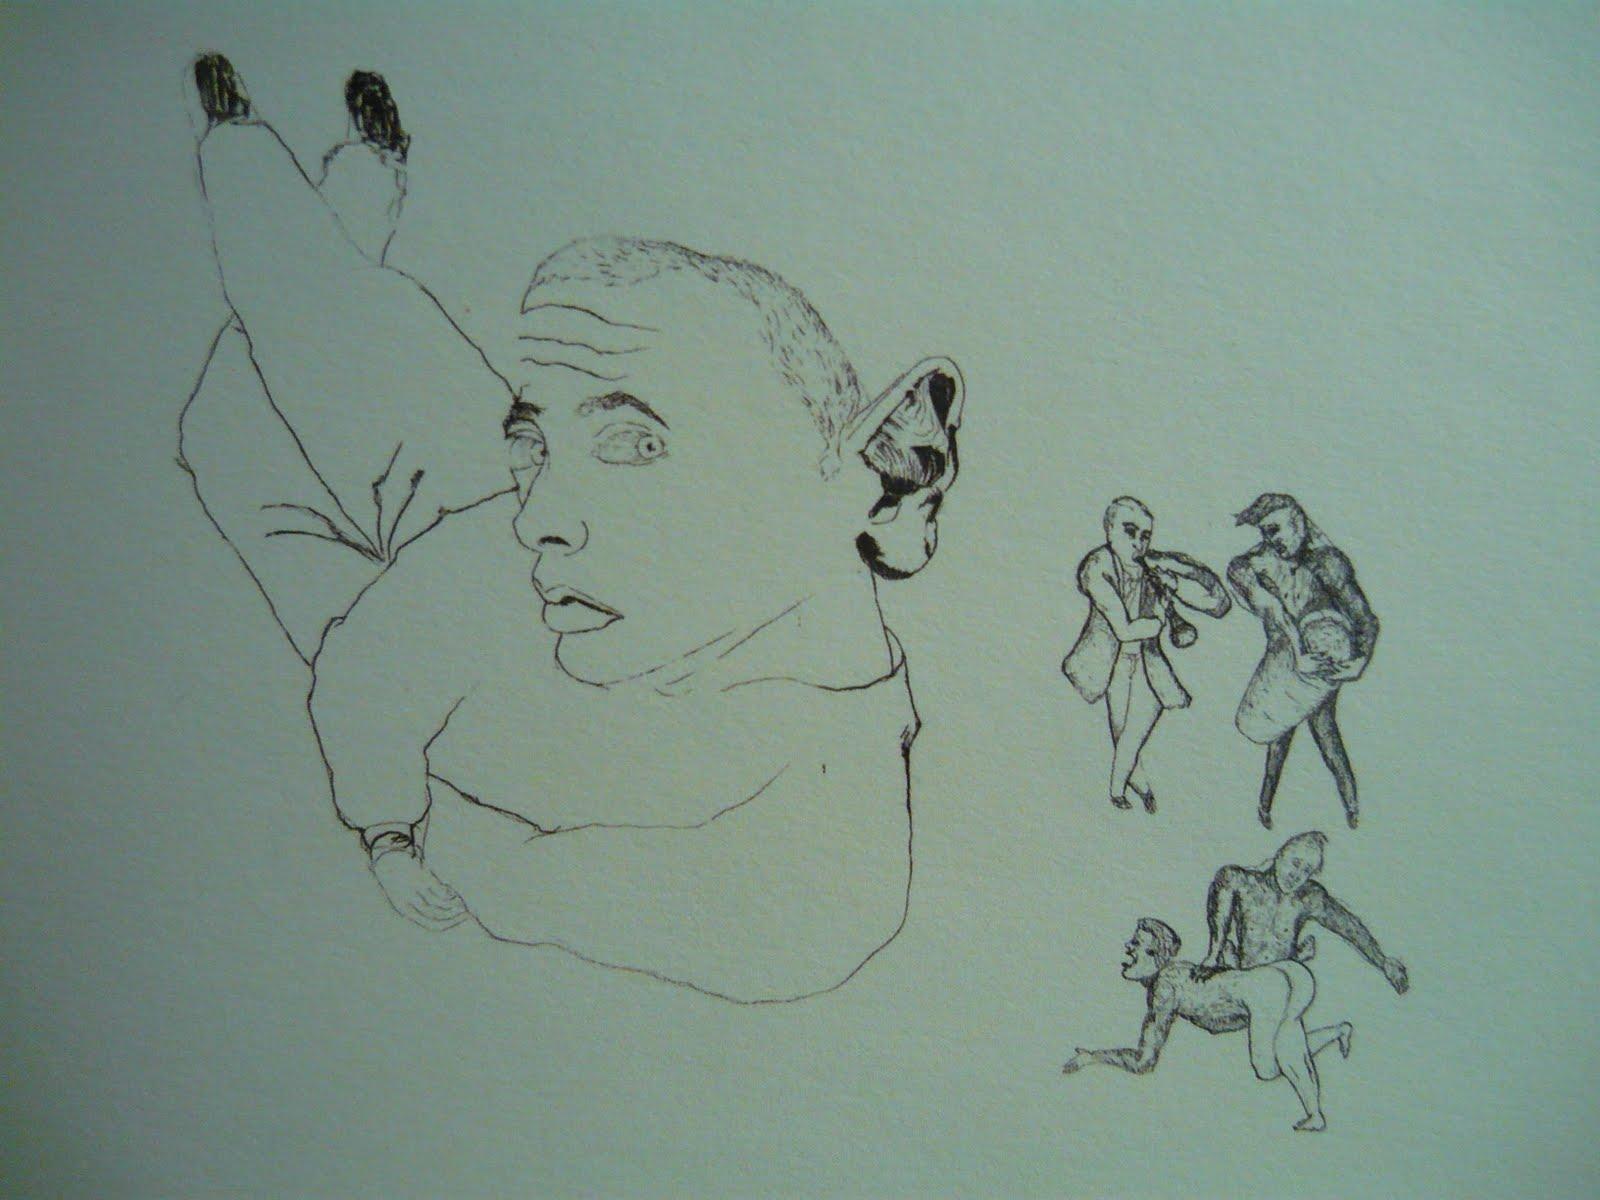 Francesco Clemente Drawings i Like How he Traverses The